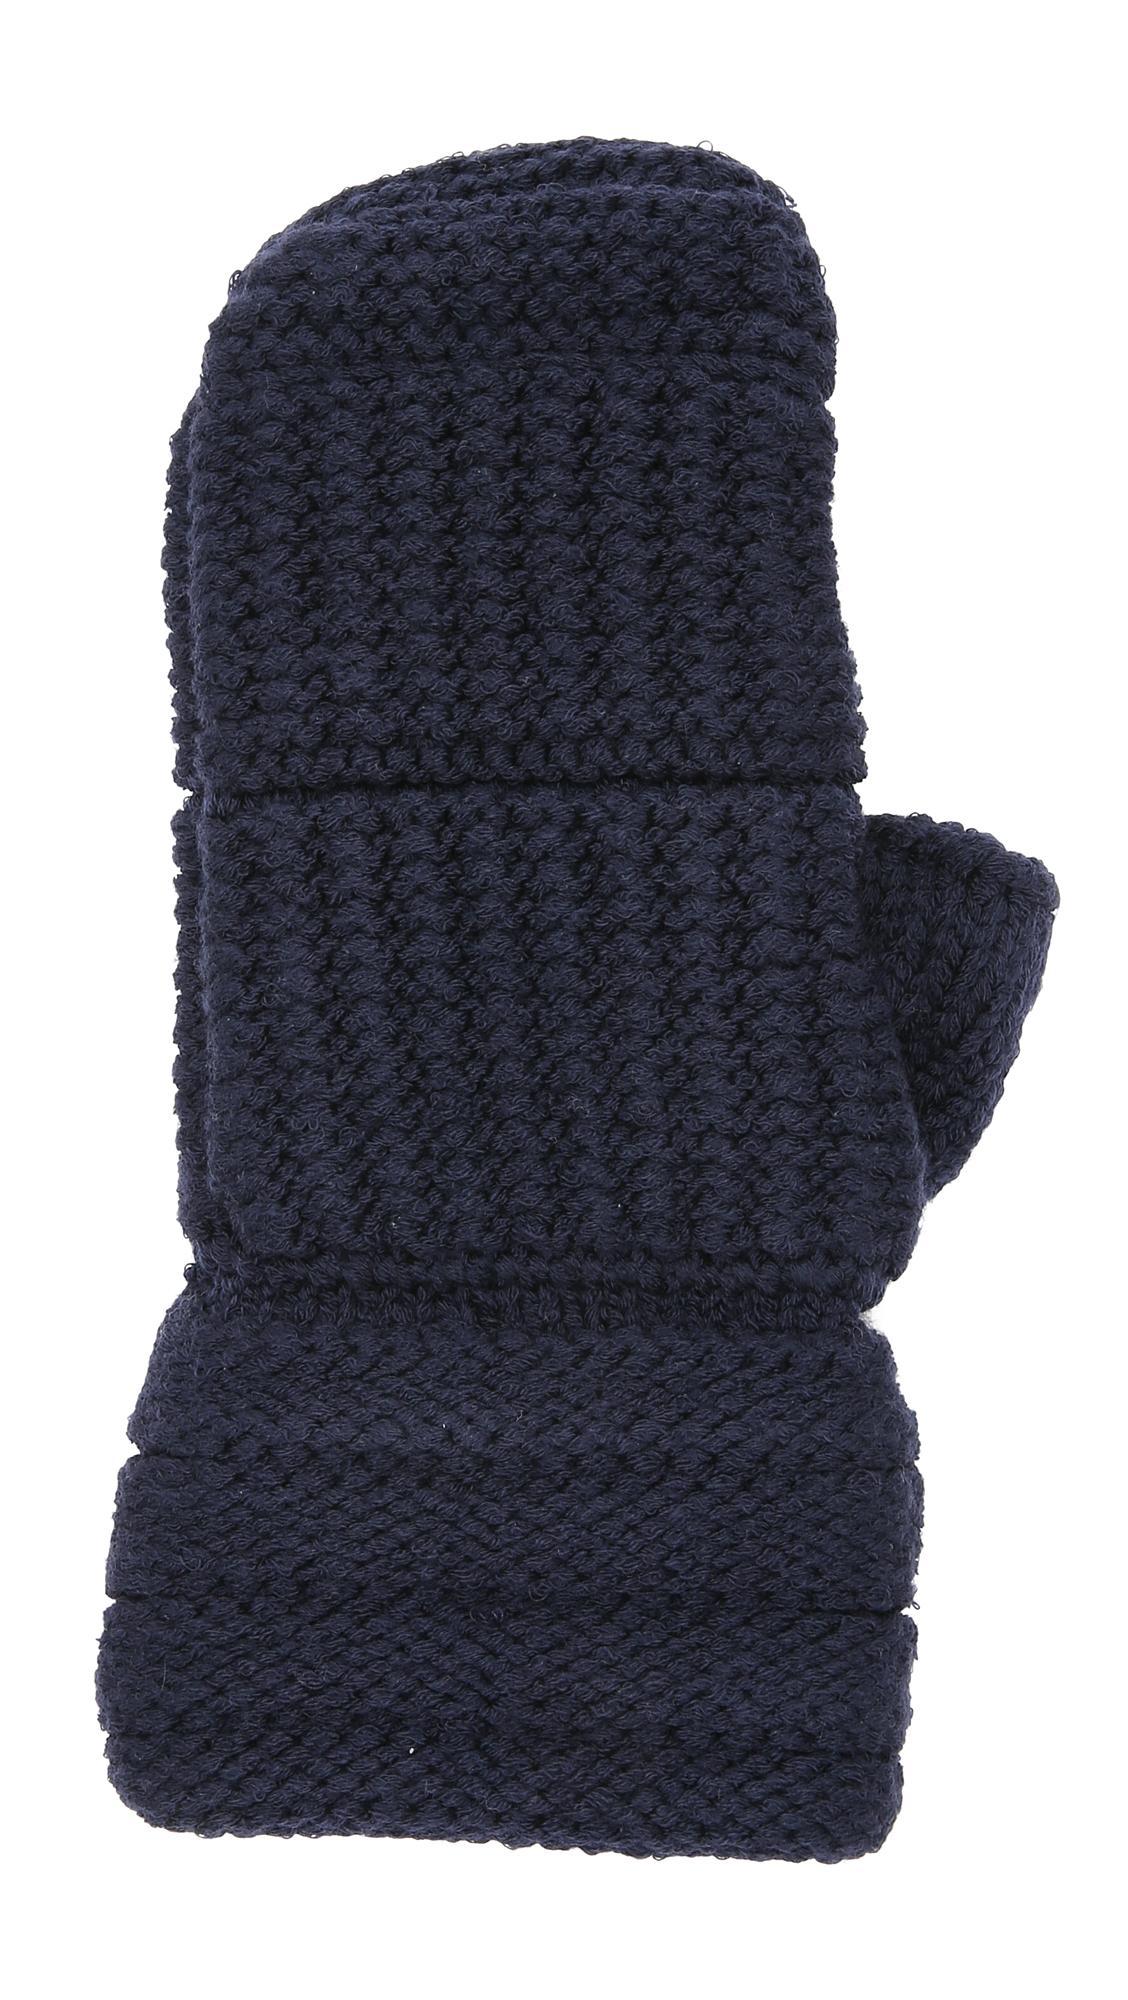 Knitting Pattern Boxing Gloves : Averett Punch Hand Knit Boxing Gloves in Blue (Navy) Lyst